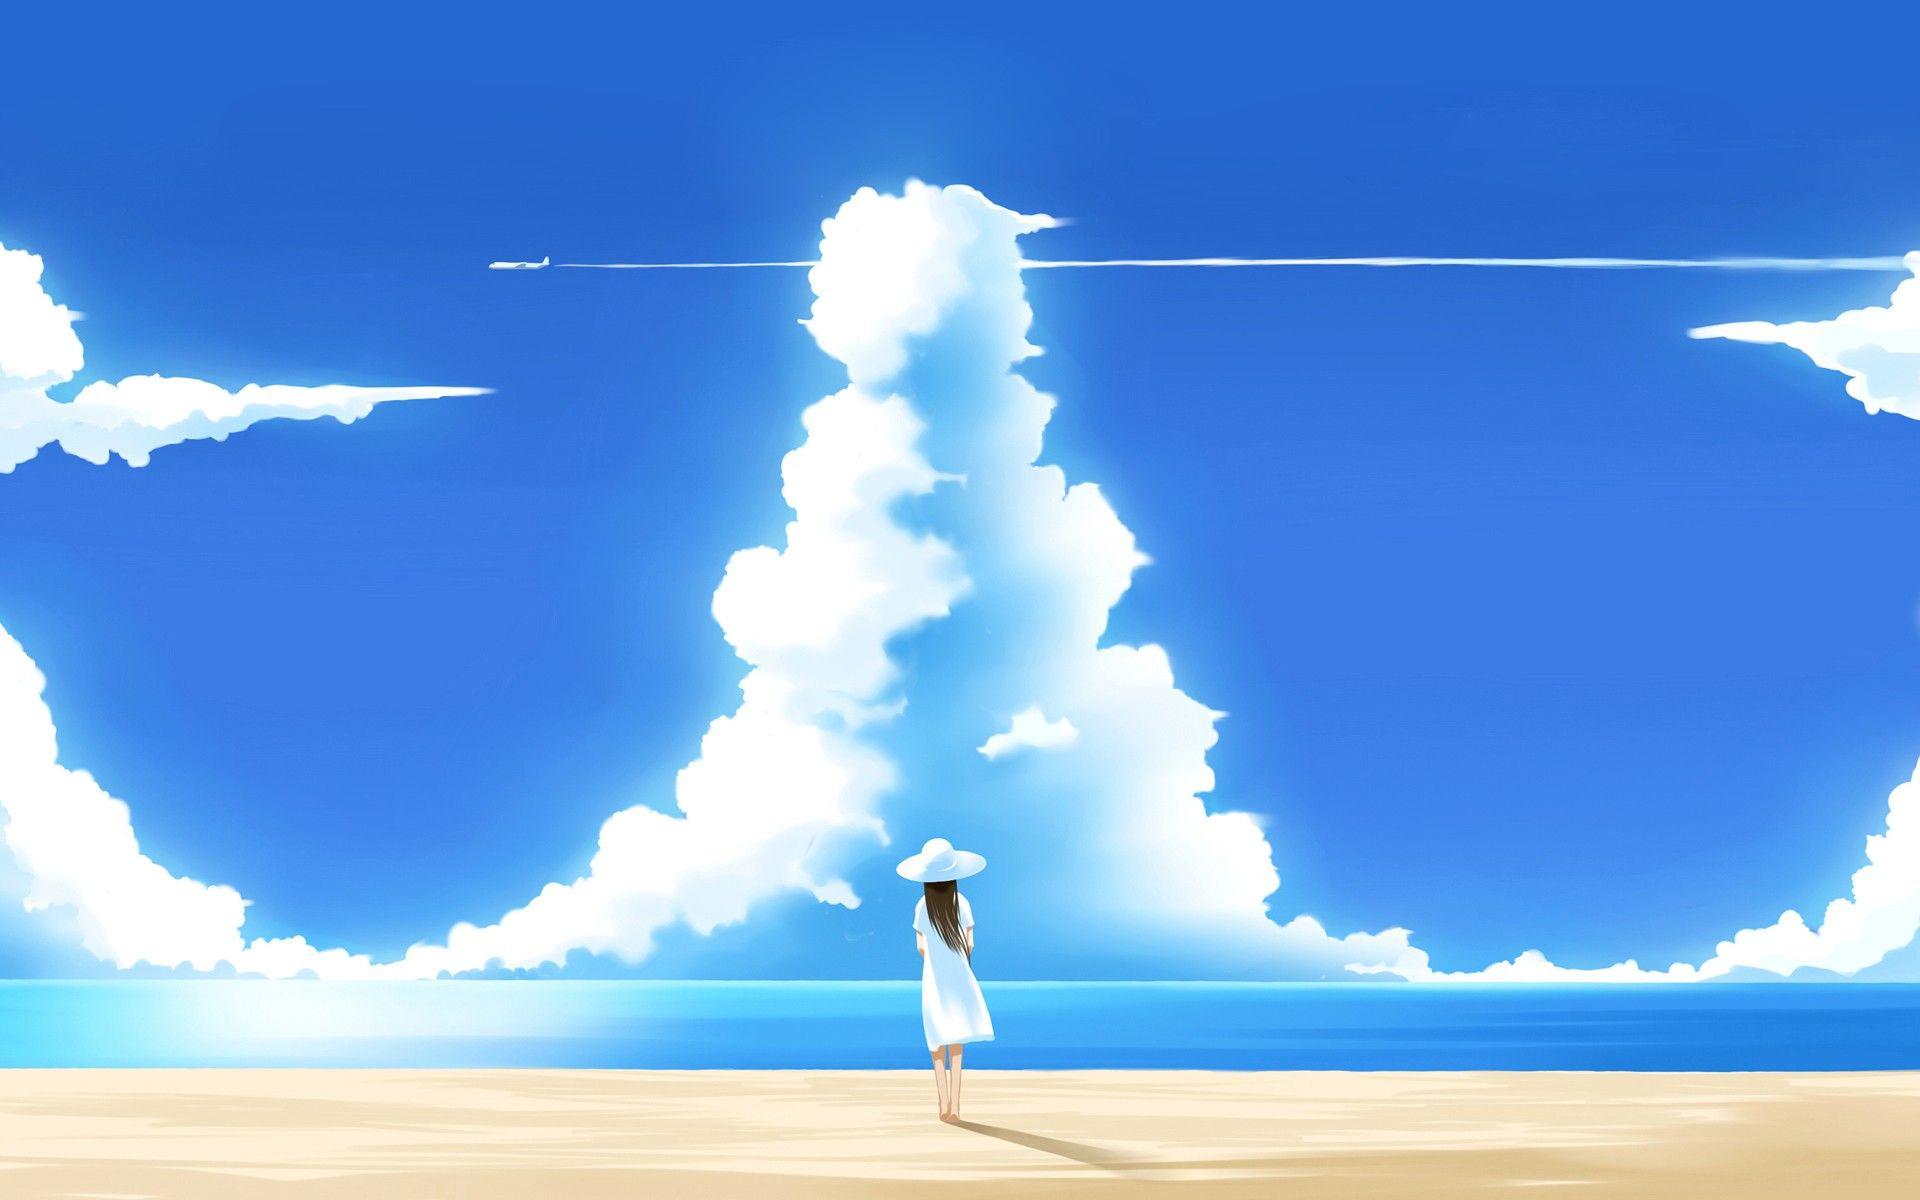 Aircraft Beach People Anime Sky Clouds Anime Girls